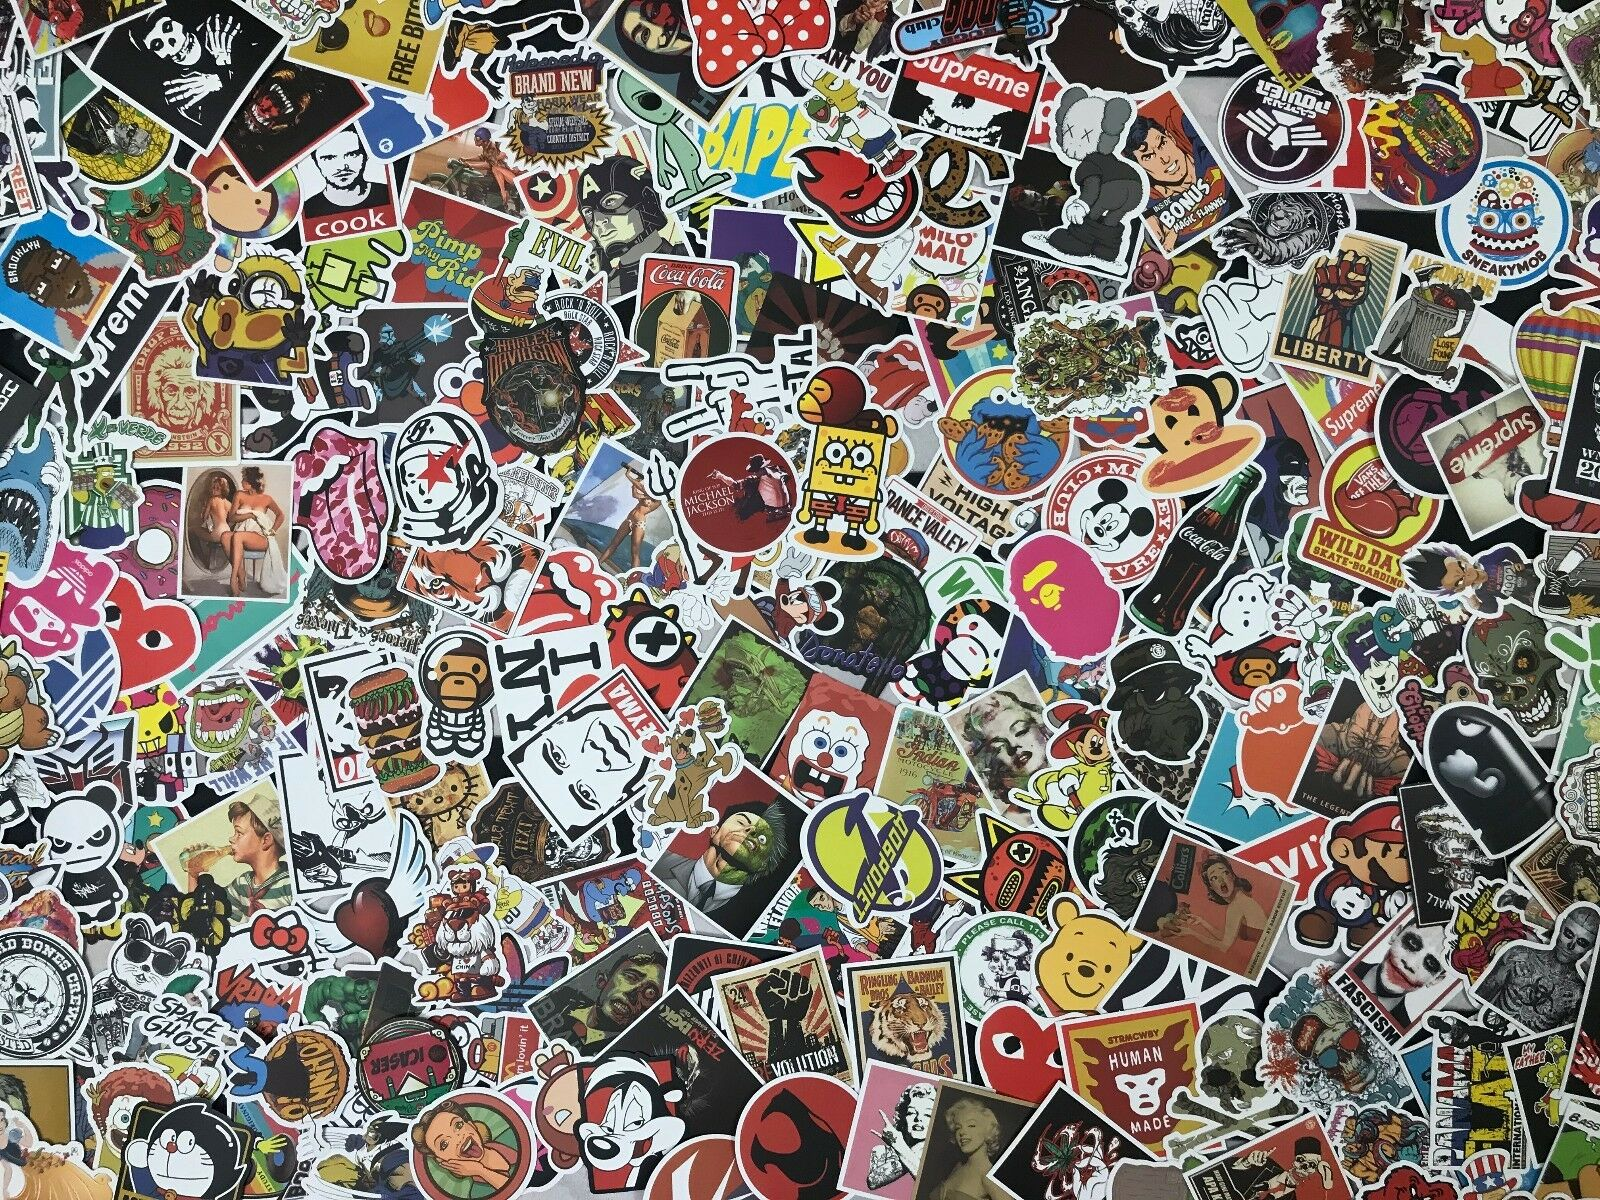 Lot 100 Random Vinyl Laptop Skateboard Stickers Bomb